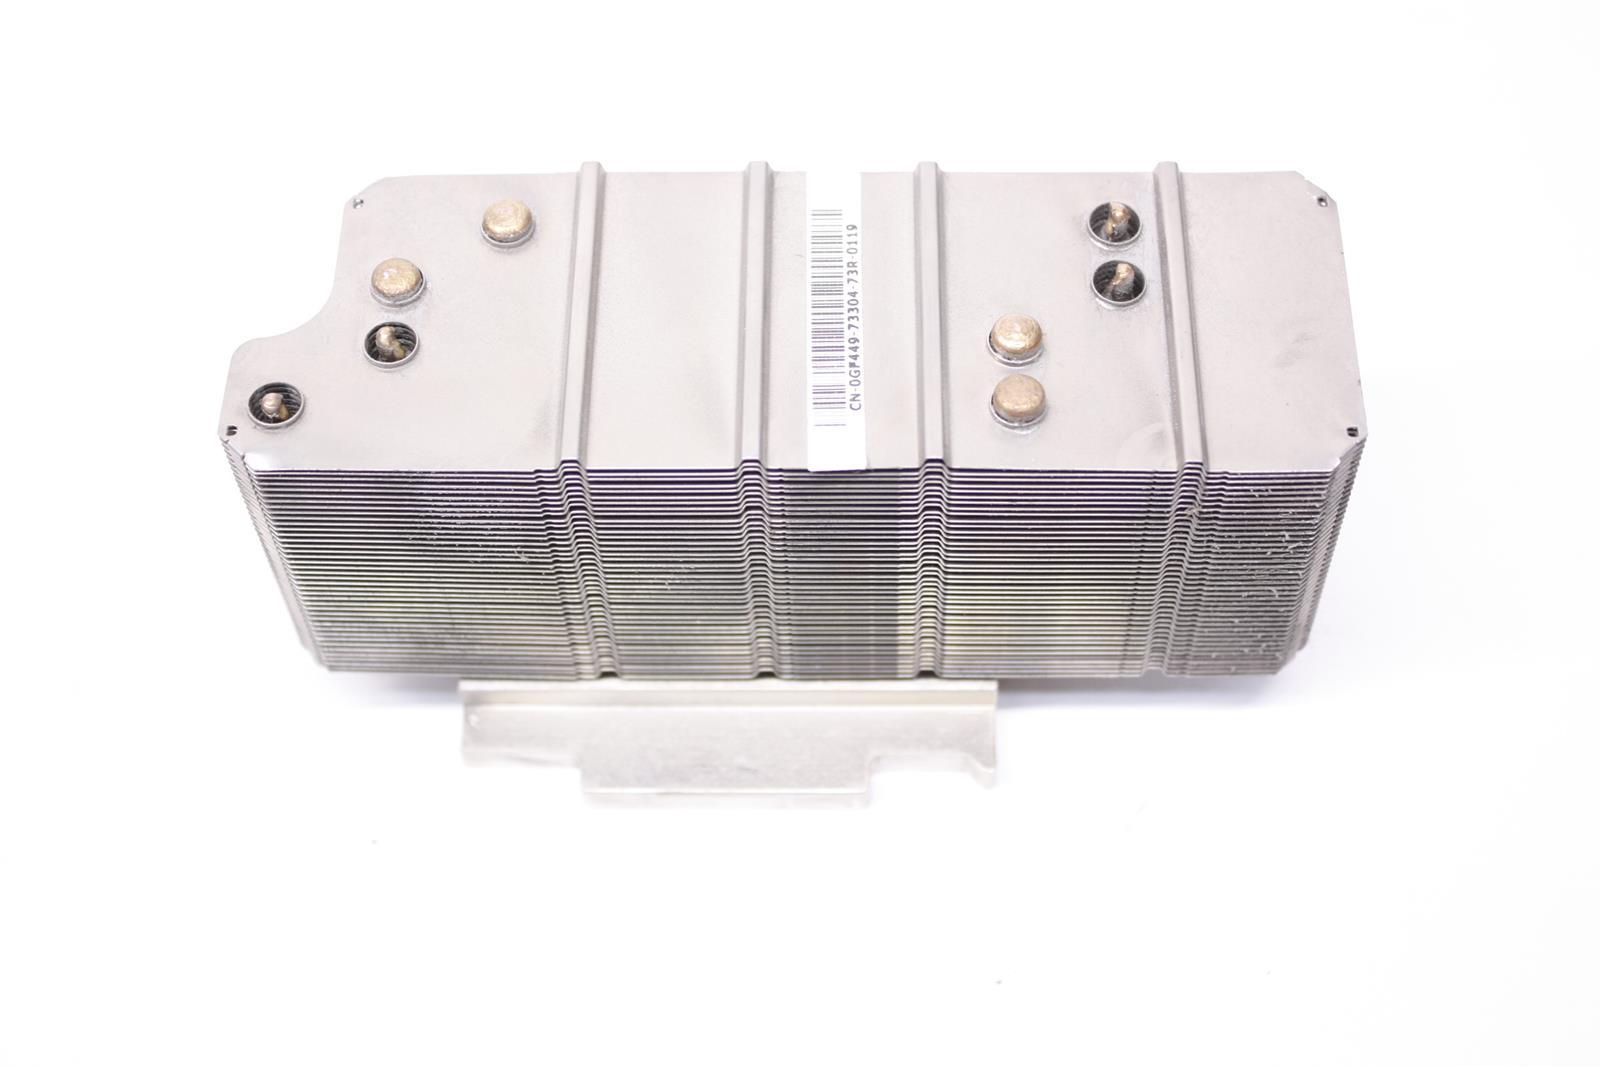 Dell PowerEdge 2950 Server Xeon CPU Heatsink 0GF449